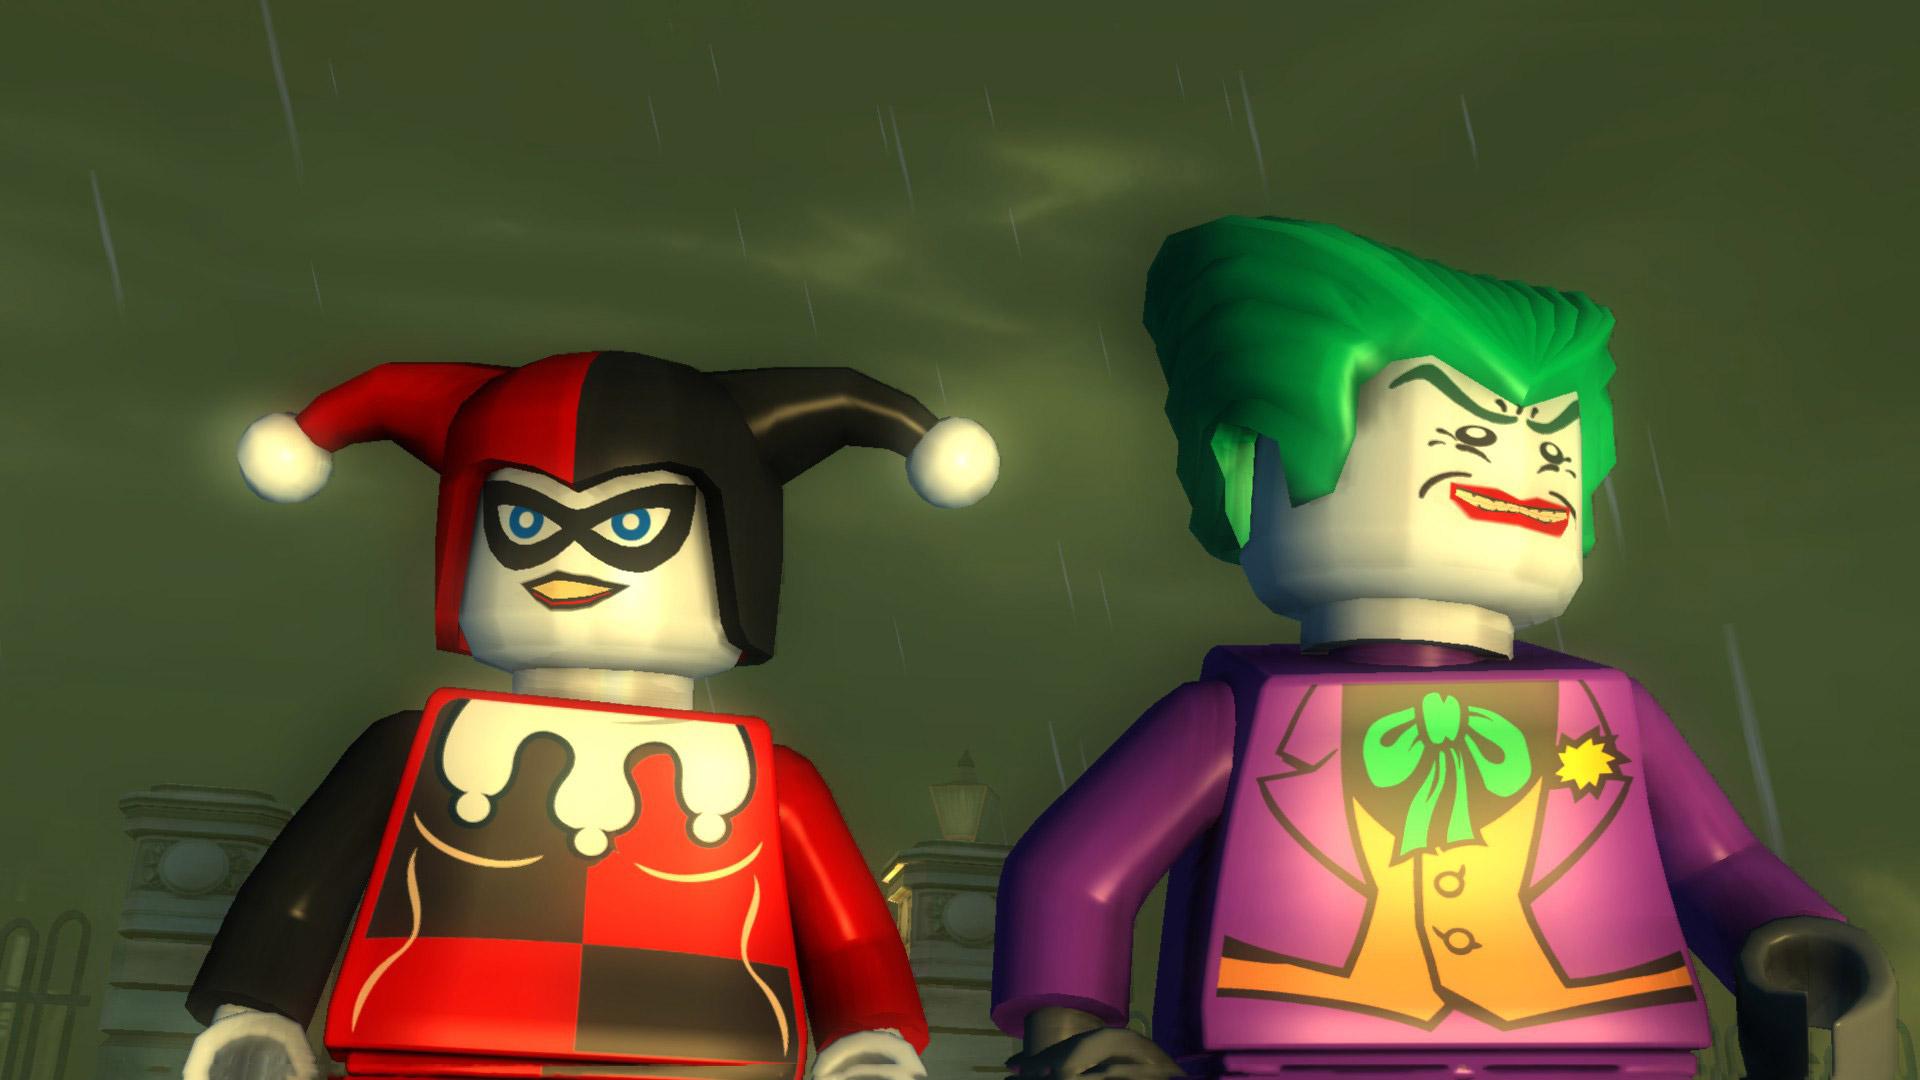 Free Lego Batman: The Videogame Wallpaper in 1920x1080